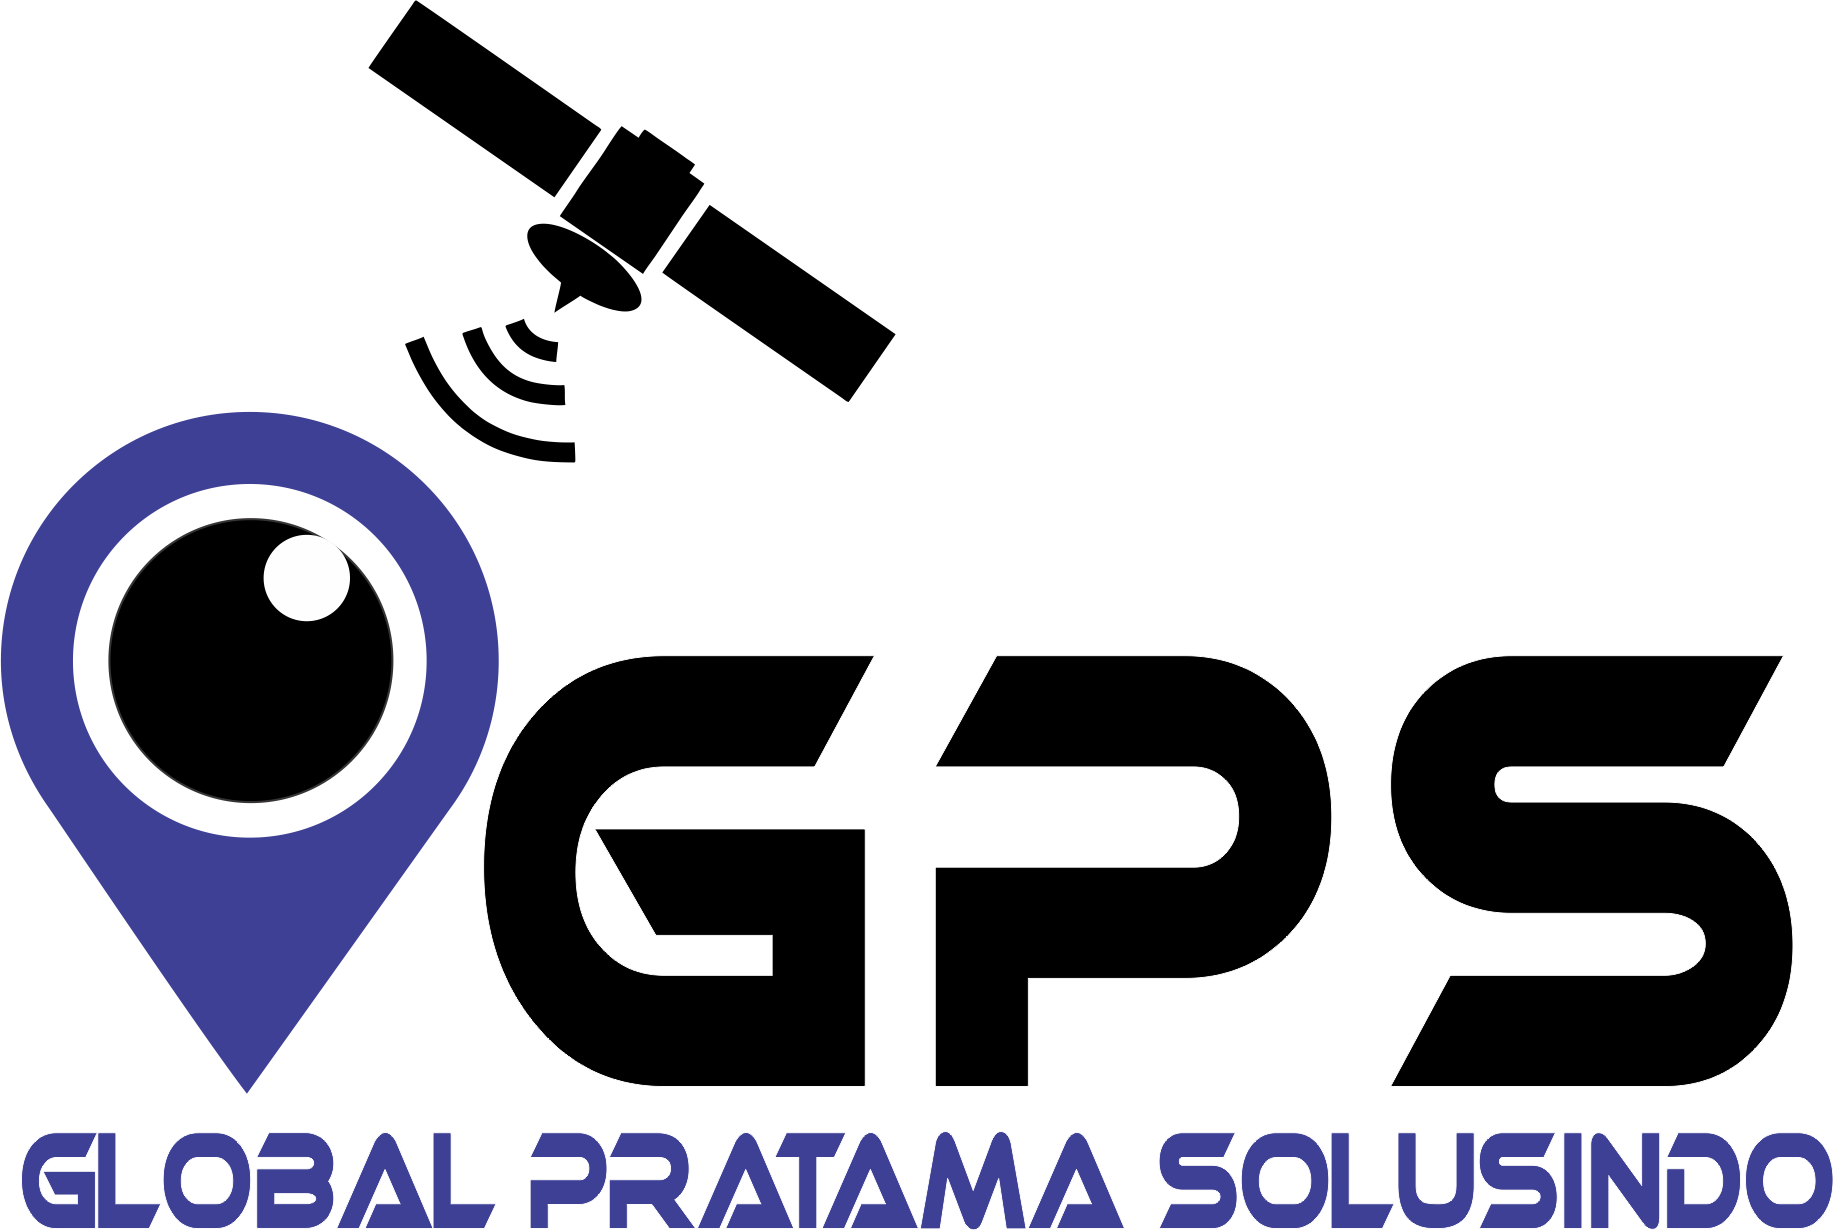 PT. Global Pratama Solusindo